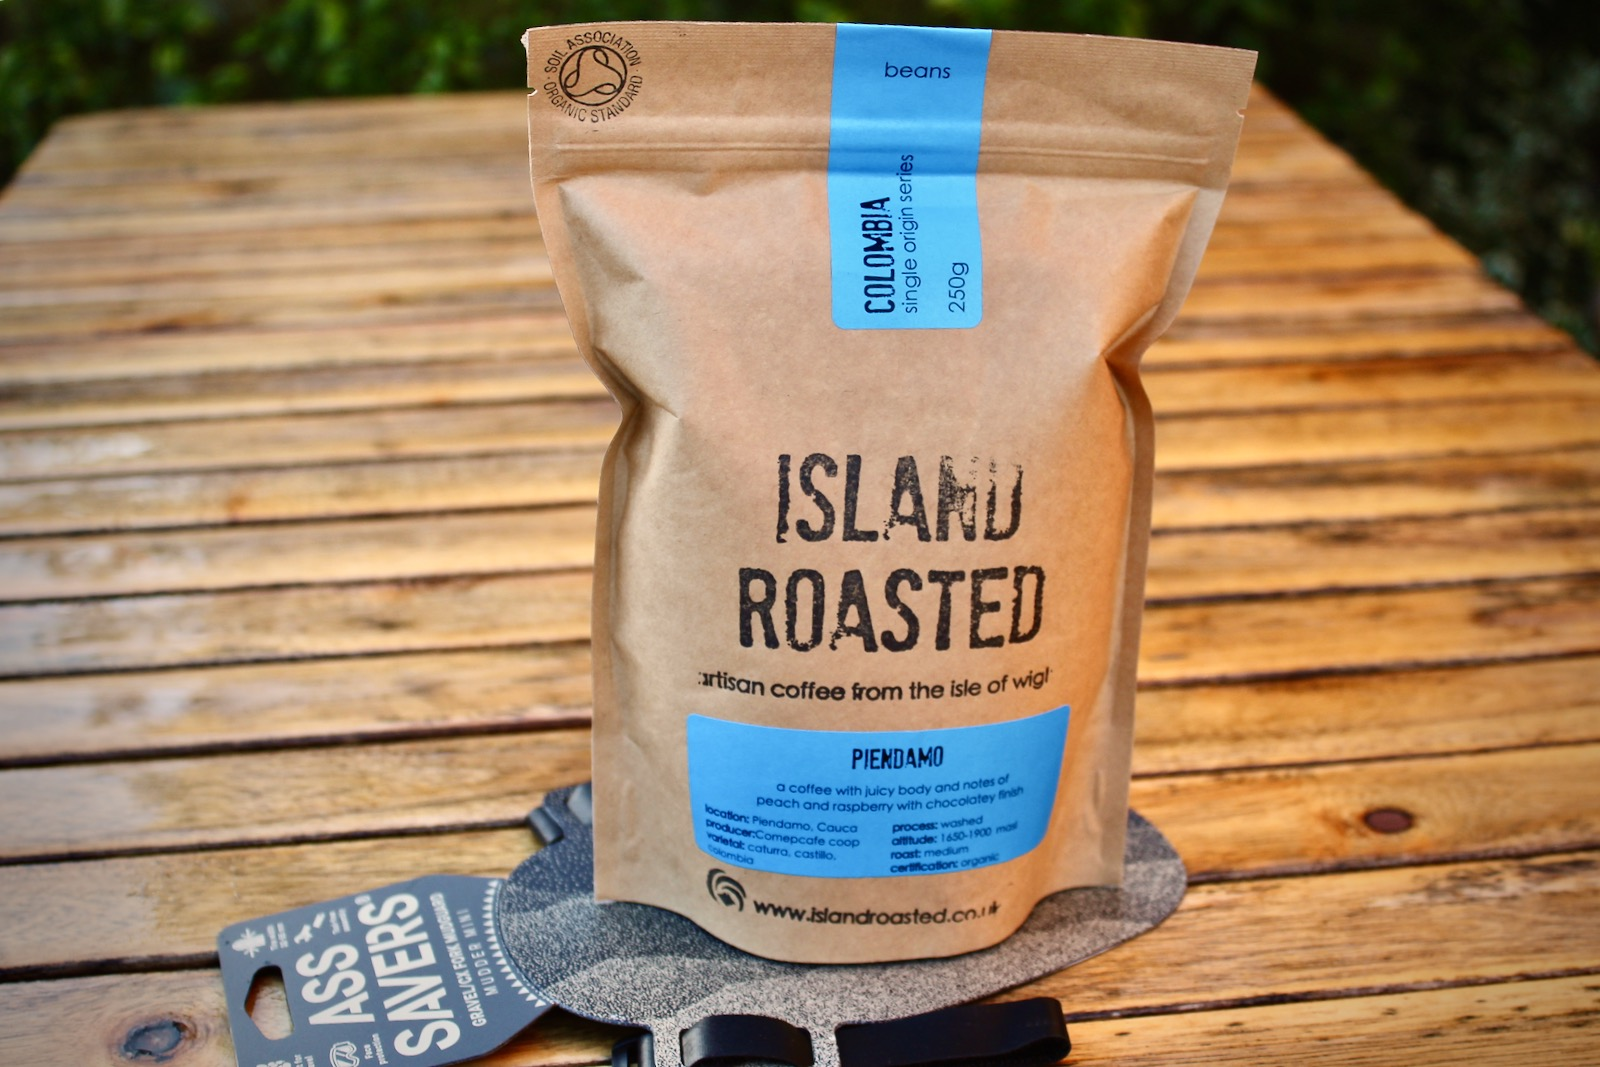 Island Roasted Coffee